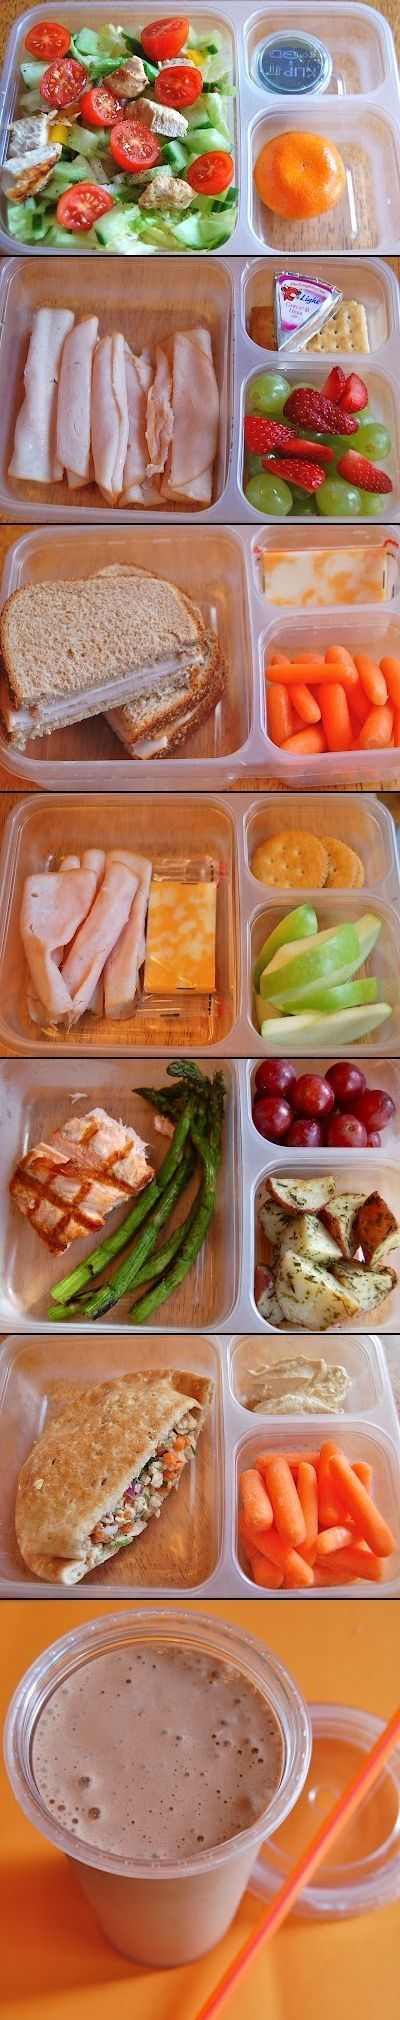 Healthy Lunch Ideas - FOODIEZ-eatzFOODIEZ-eatz